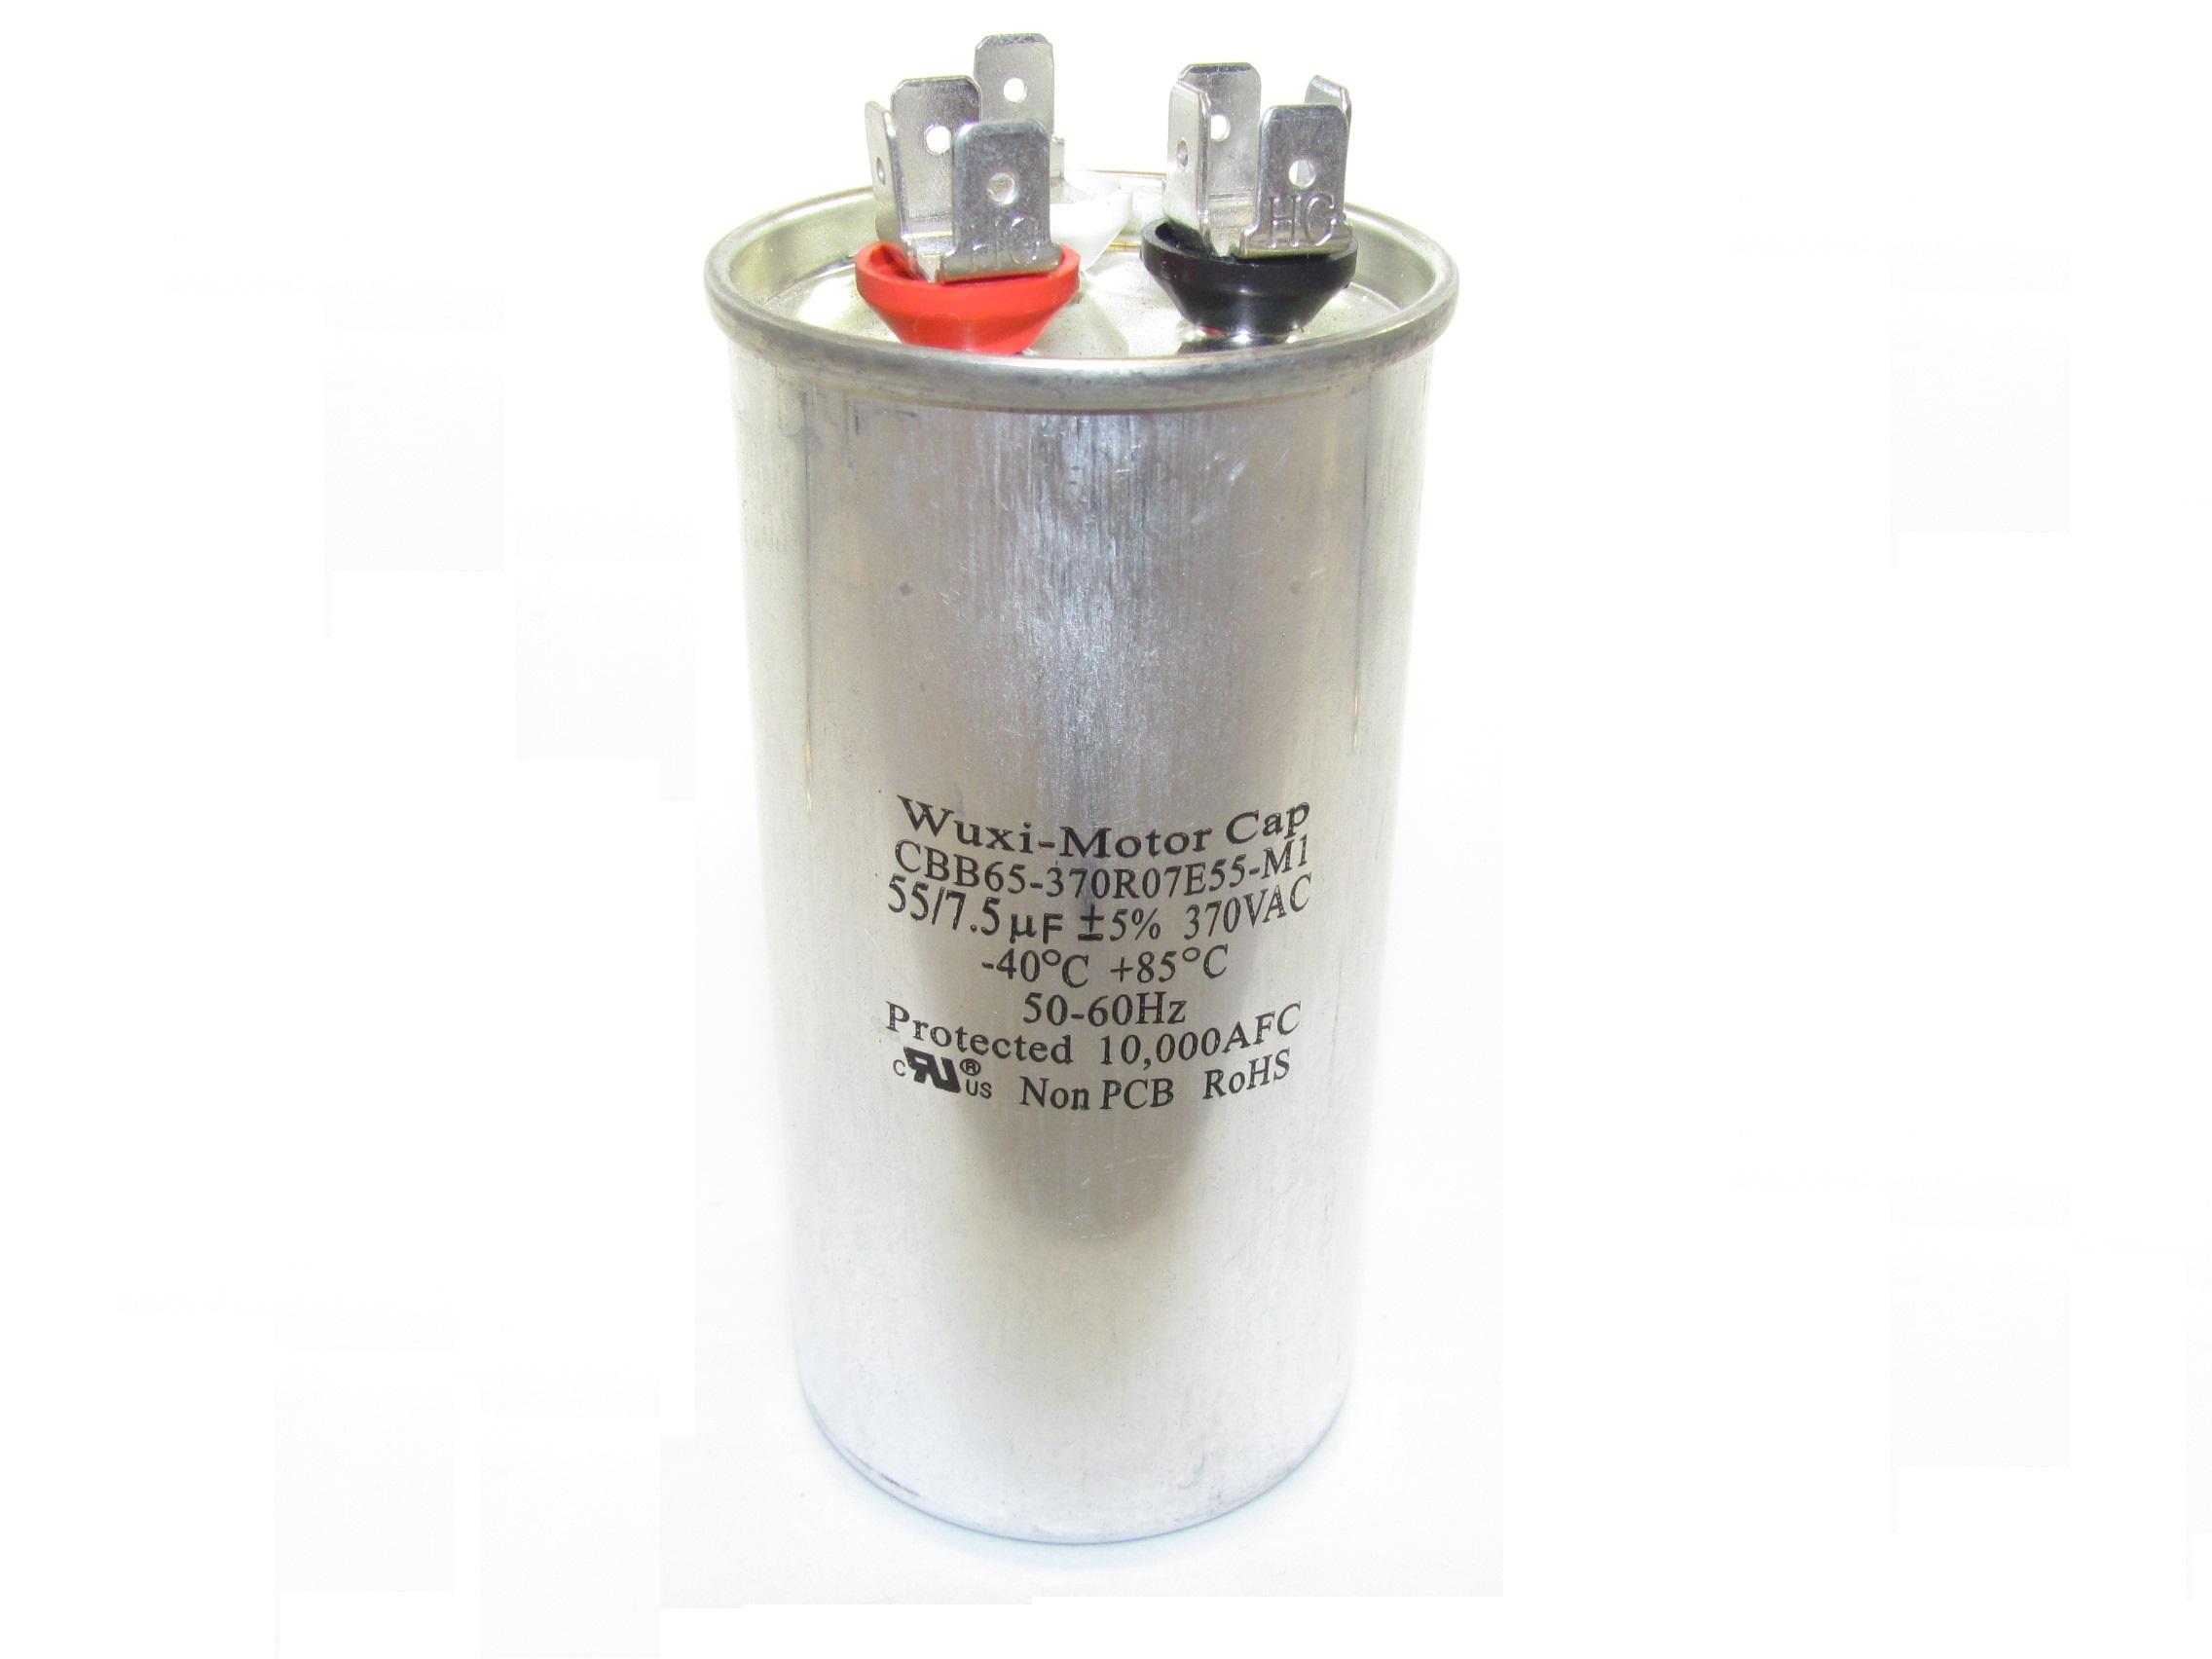 45+5 uF MFD 370 440 VAC Round Motor Dual Run Capacitor 50//60Hz CBB65-440R0545-M1